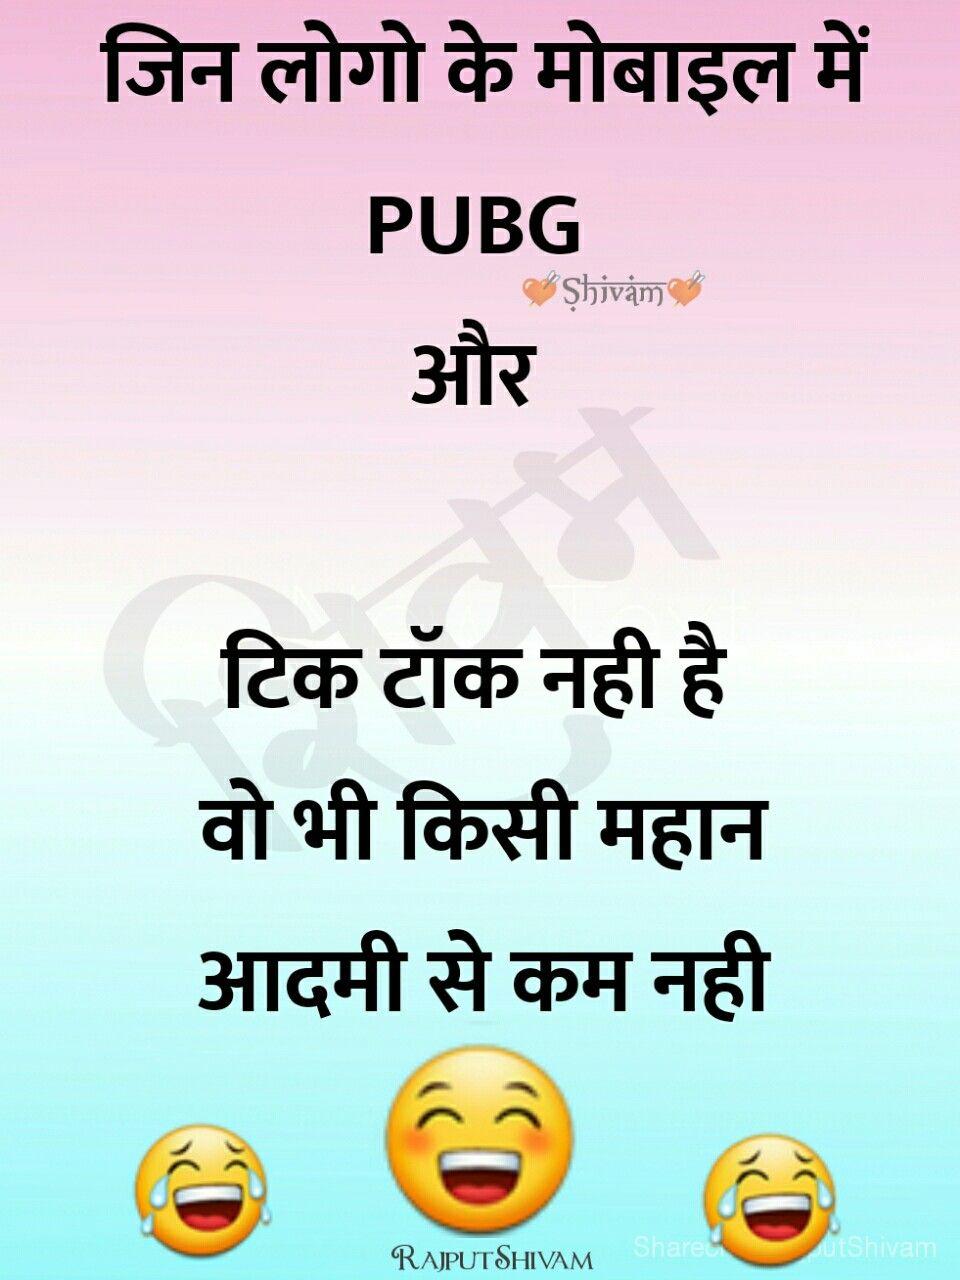 Pubg Funny Jokes In Hindi : funny, jokes, hindi, Khelti, Tiktok, Chalati, Friendship, Quotes, Funny,, Funny, Jokes,, Sarcastic, Witty